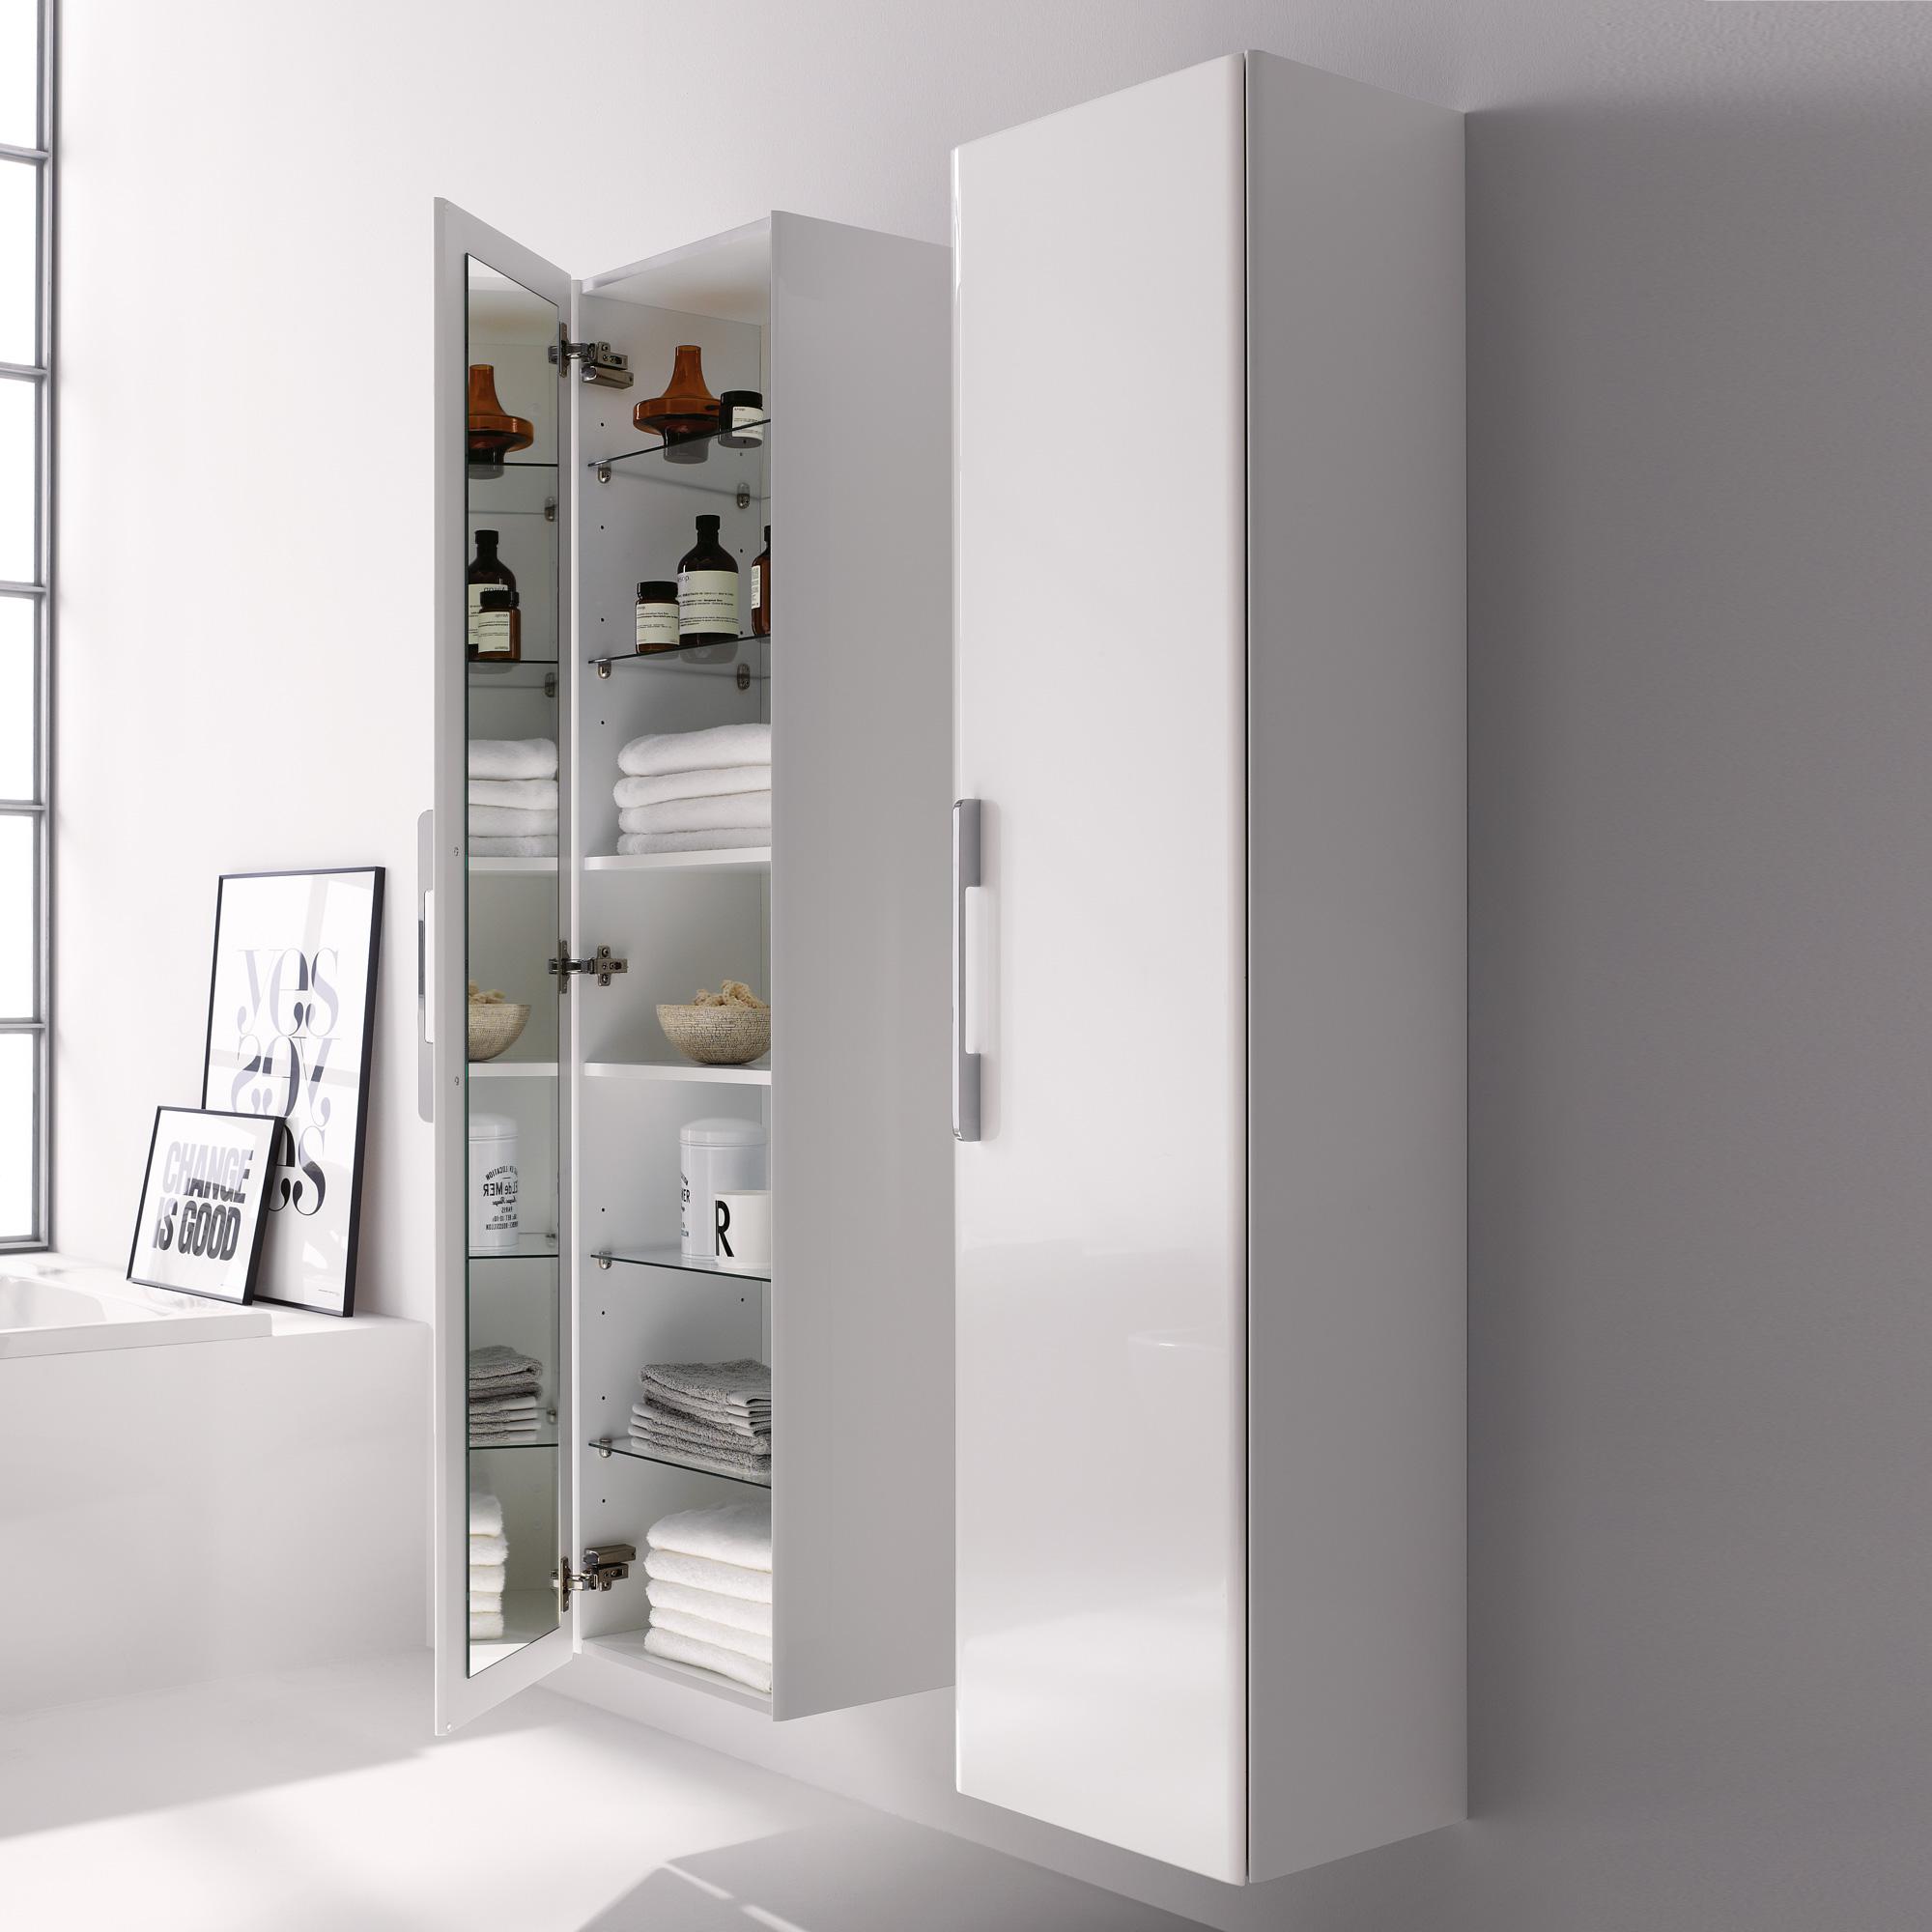 keramag it hochschrank wei hochglanz 819160000 reuter onlineshop. Black Bedroom Furniture Sets. Home Design Ideas